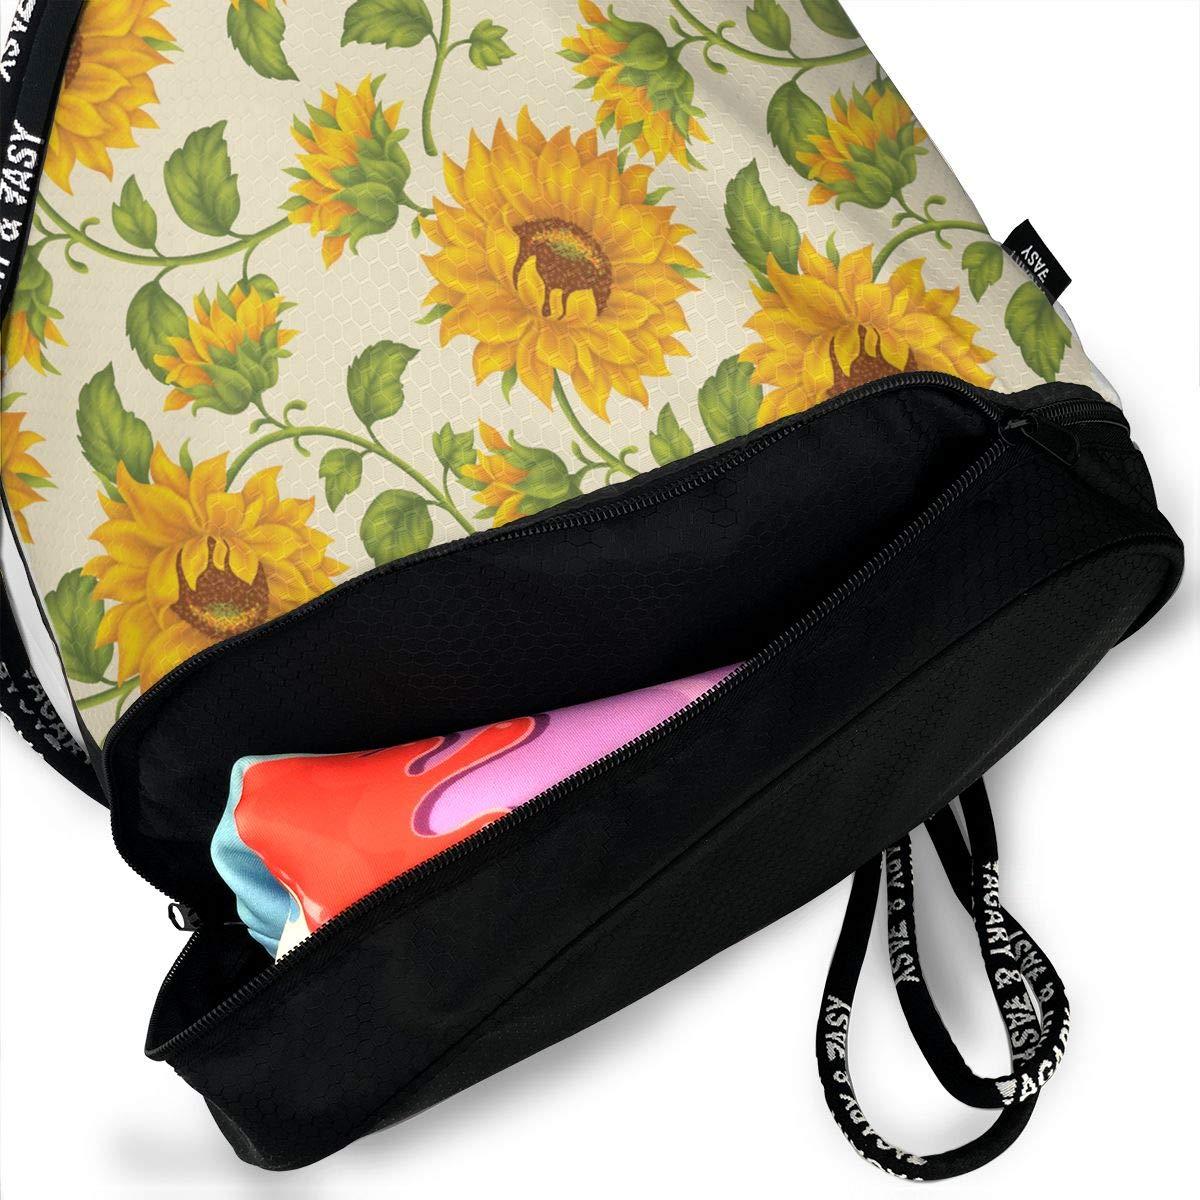 Sunflower Print Cinch Backpack Sackpack Tote Sack Zol1Q Lightweight Waterproof Large Storage Drawstring Bag for Men /& Women